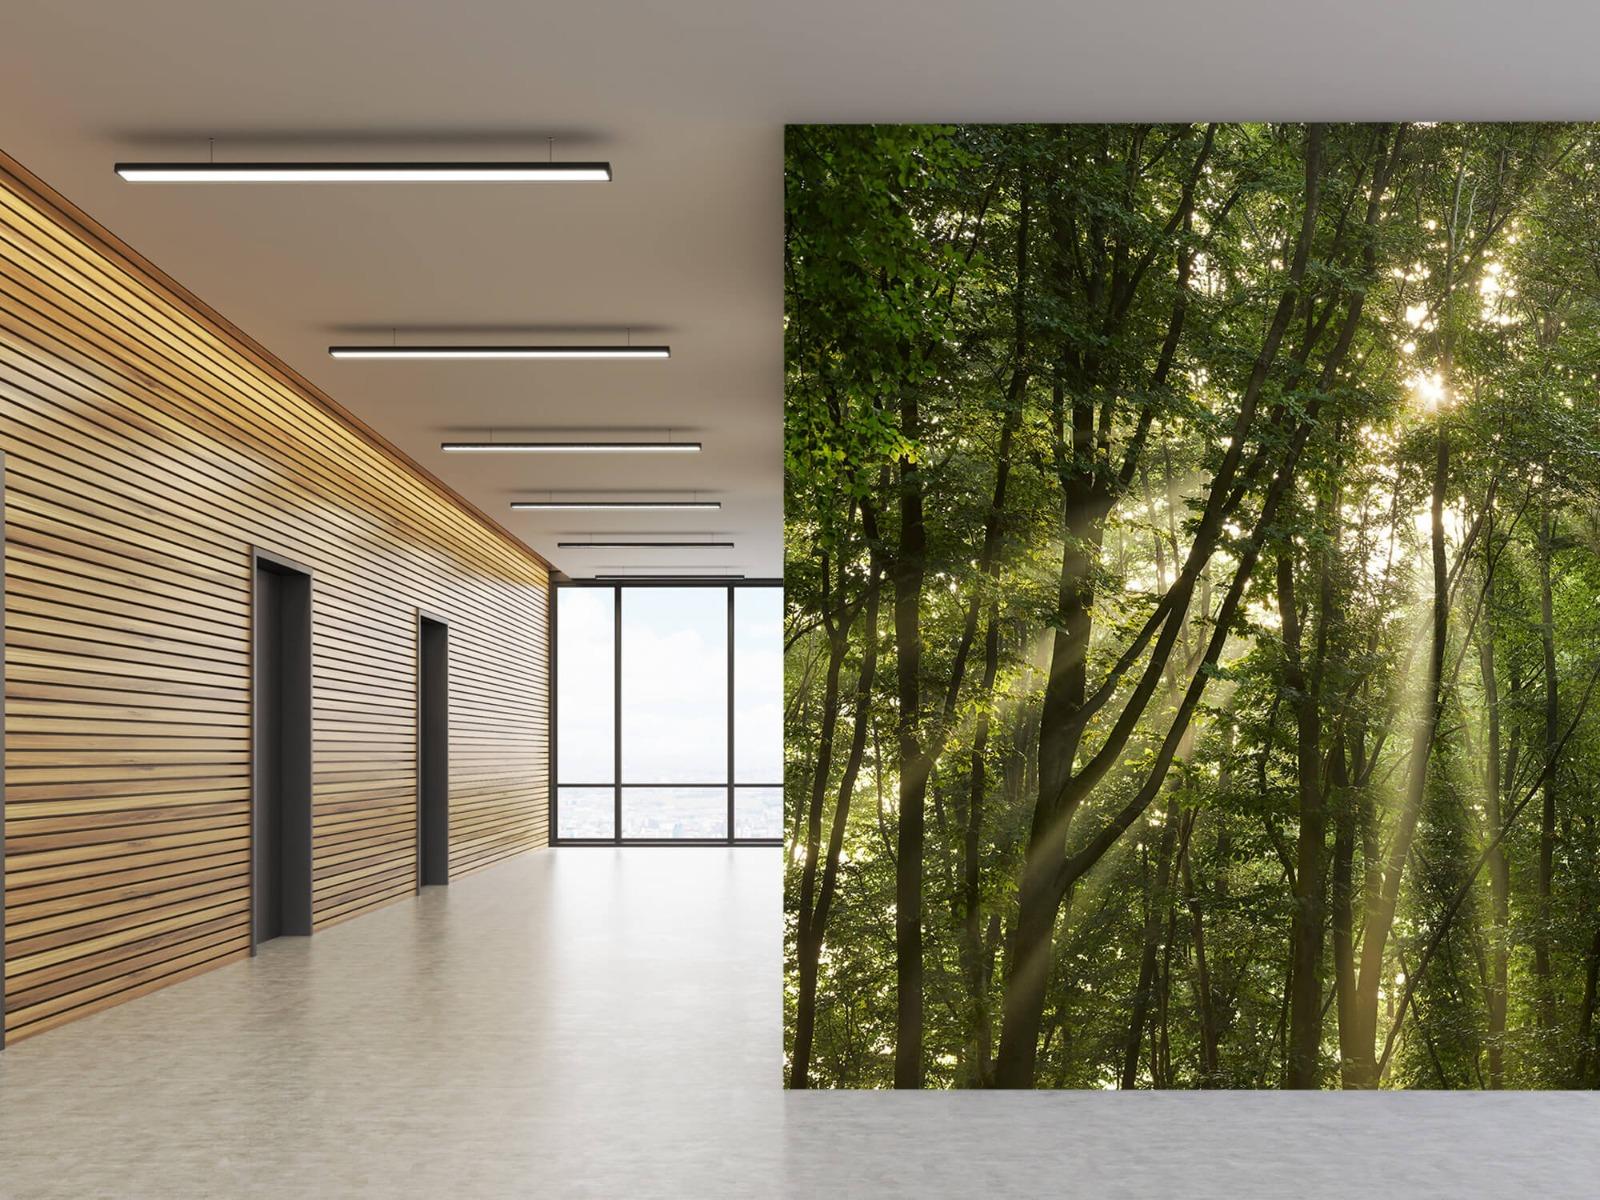 Bomen - Zonnestralen in het bos - Slaapkamer 5